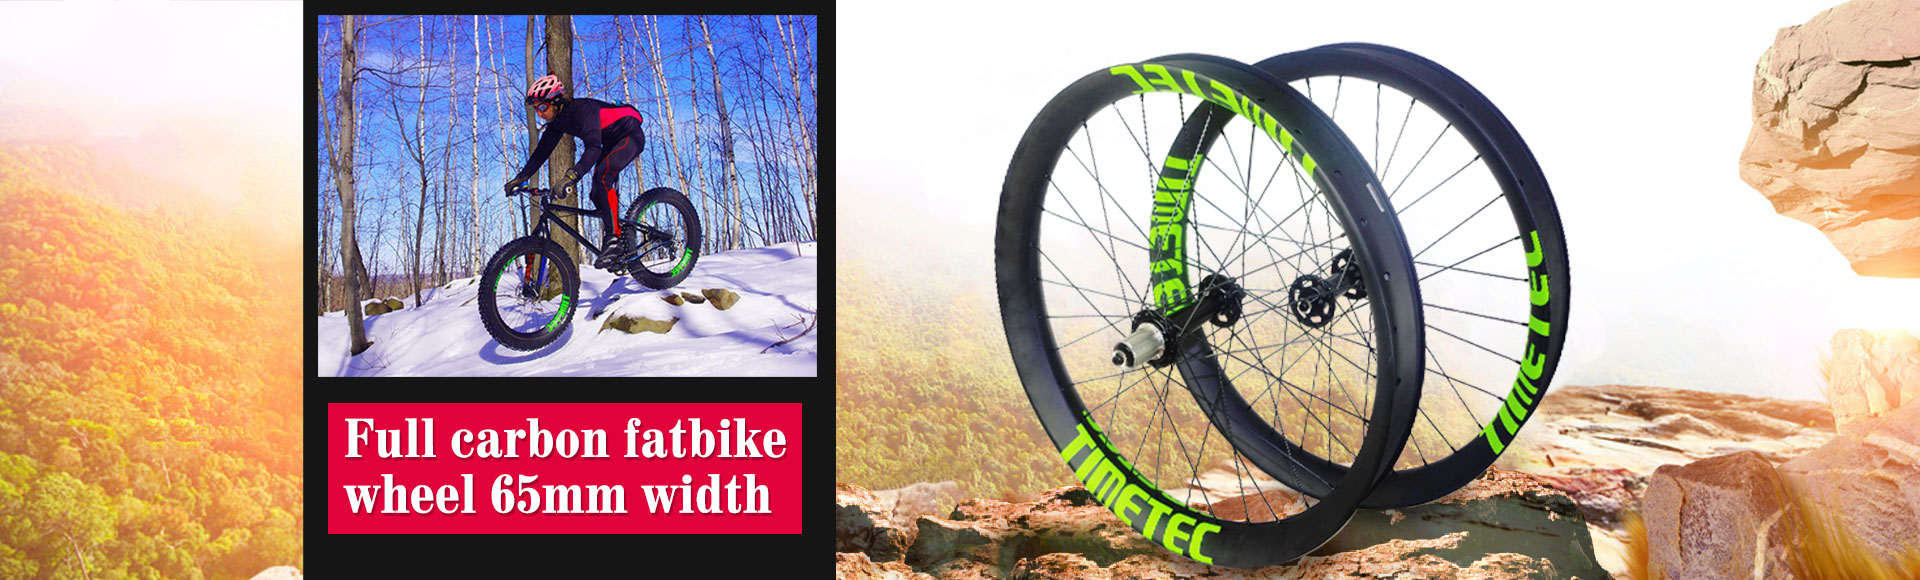 26er Fat Bike Carbon Fiber Rims Wheels 65mm